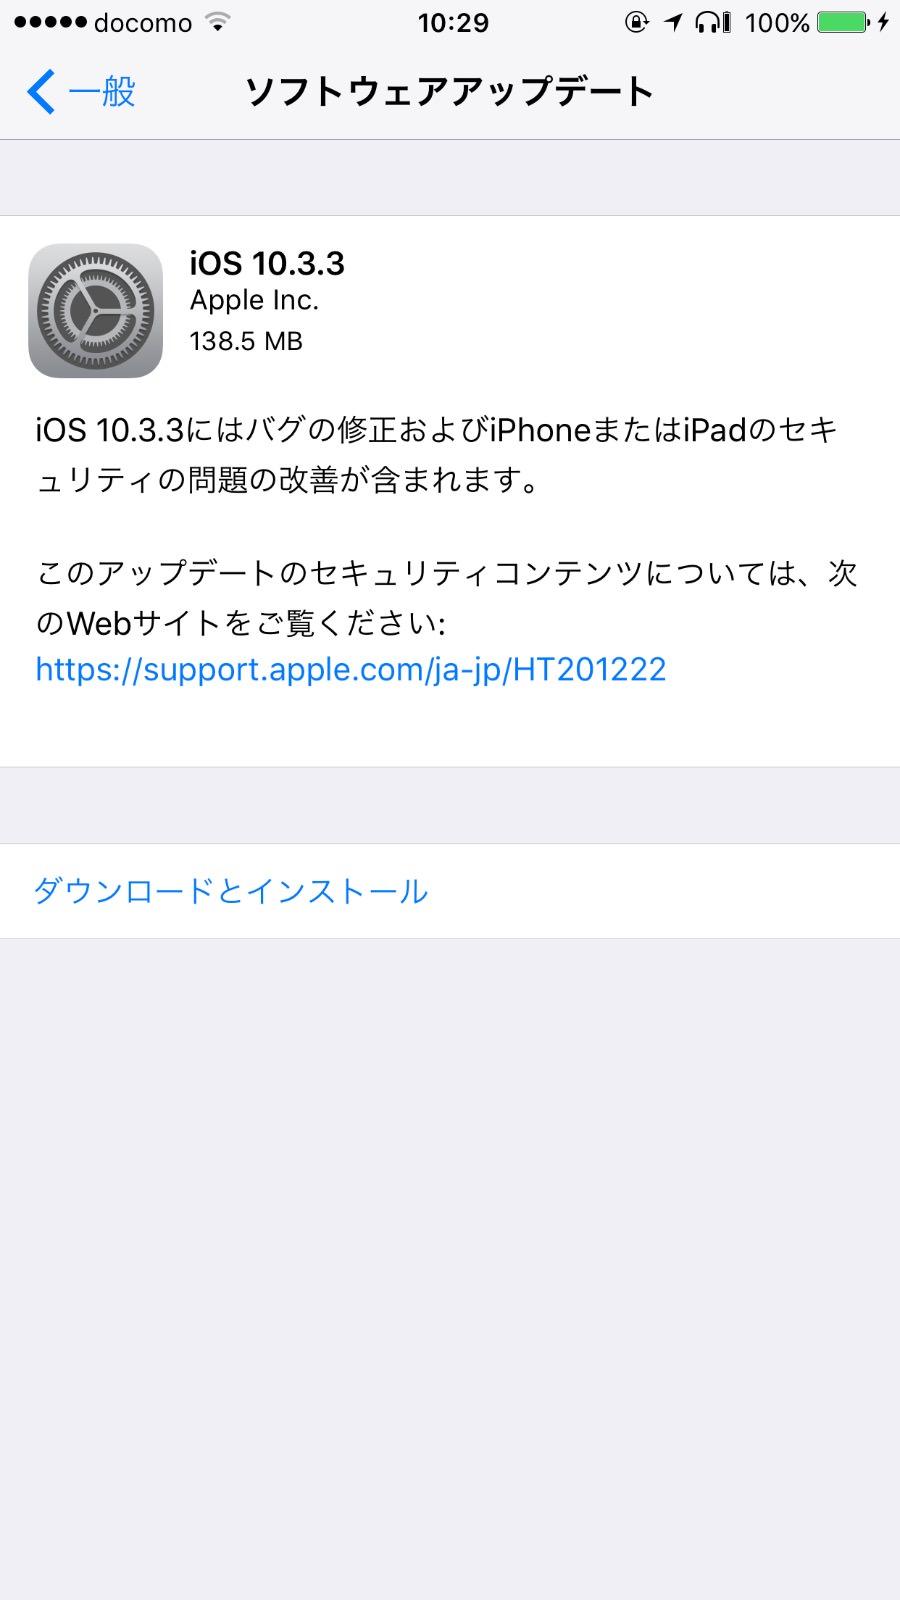 「iOS 10.3.3ソフトウェアアップデート」リリース